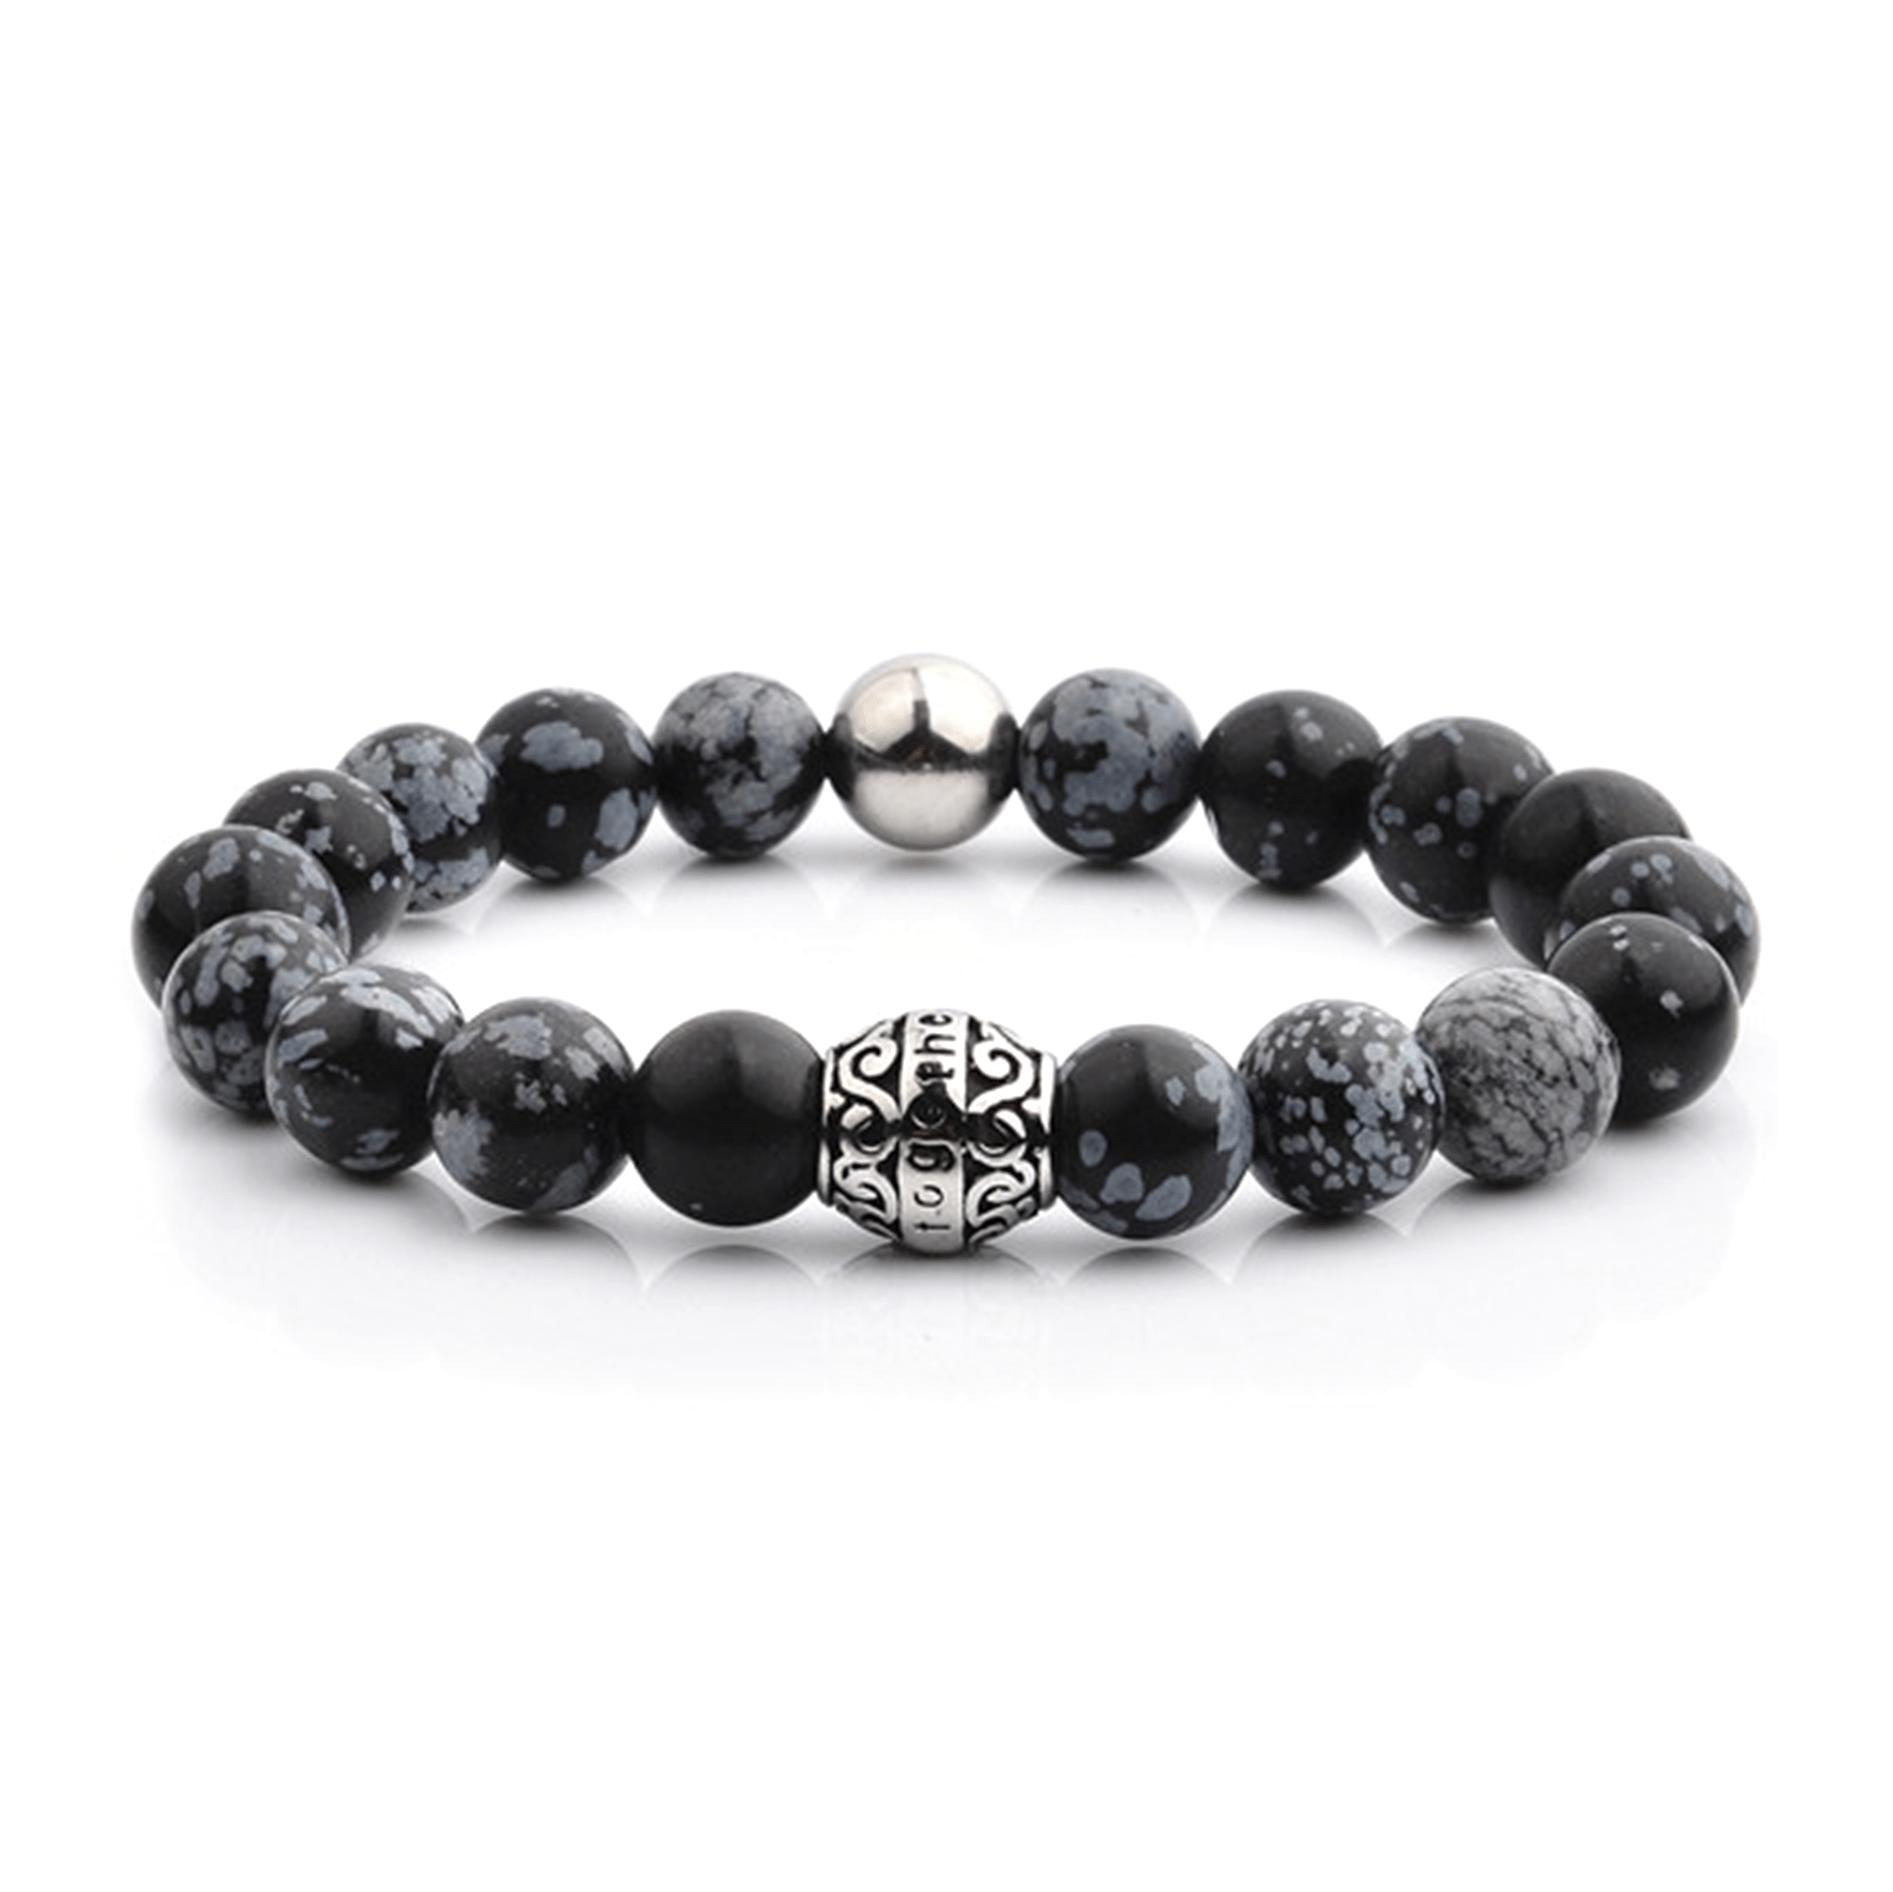 HYLIZO X Series 202 - Black Marble Beaded bracelet with 316 Stainless Steel Luxury Engraving